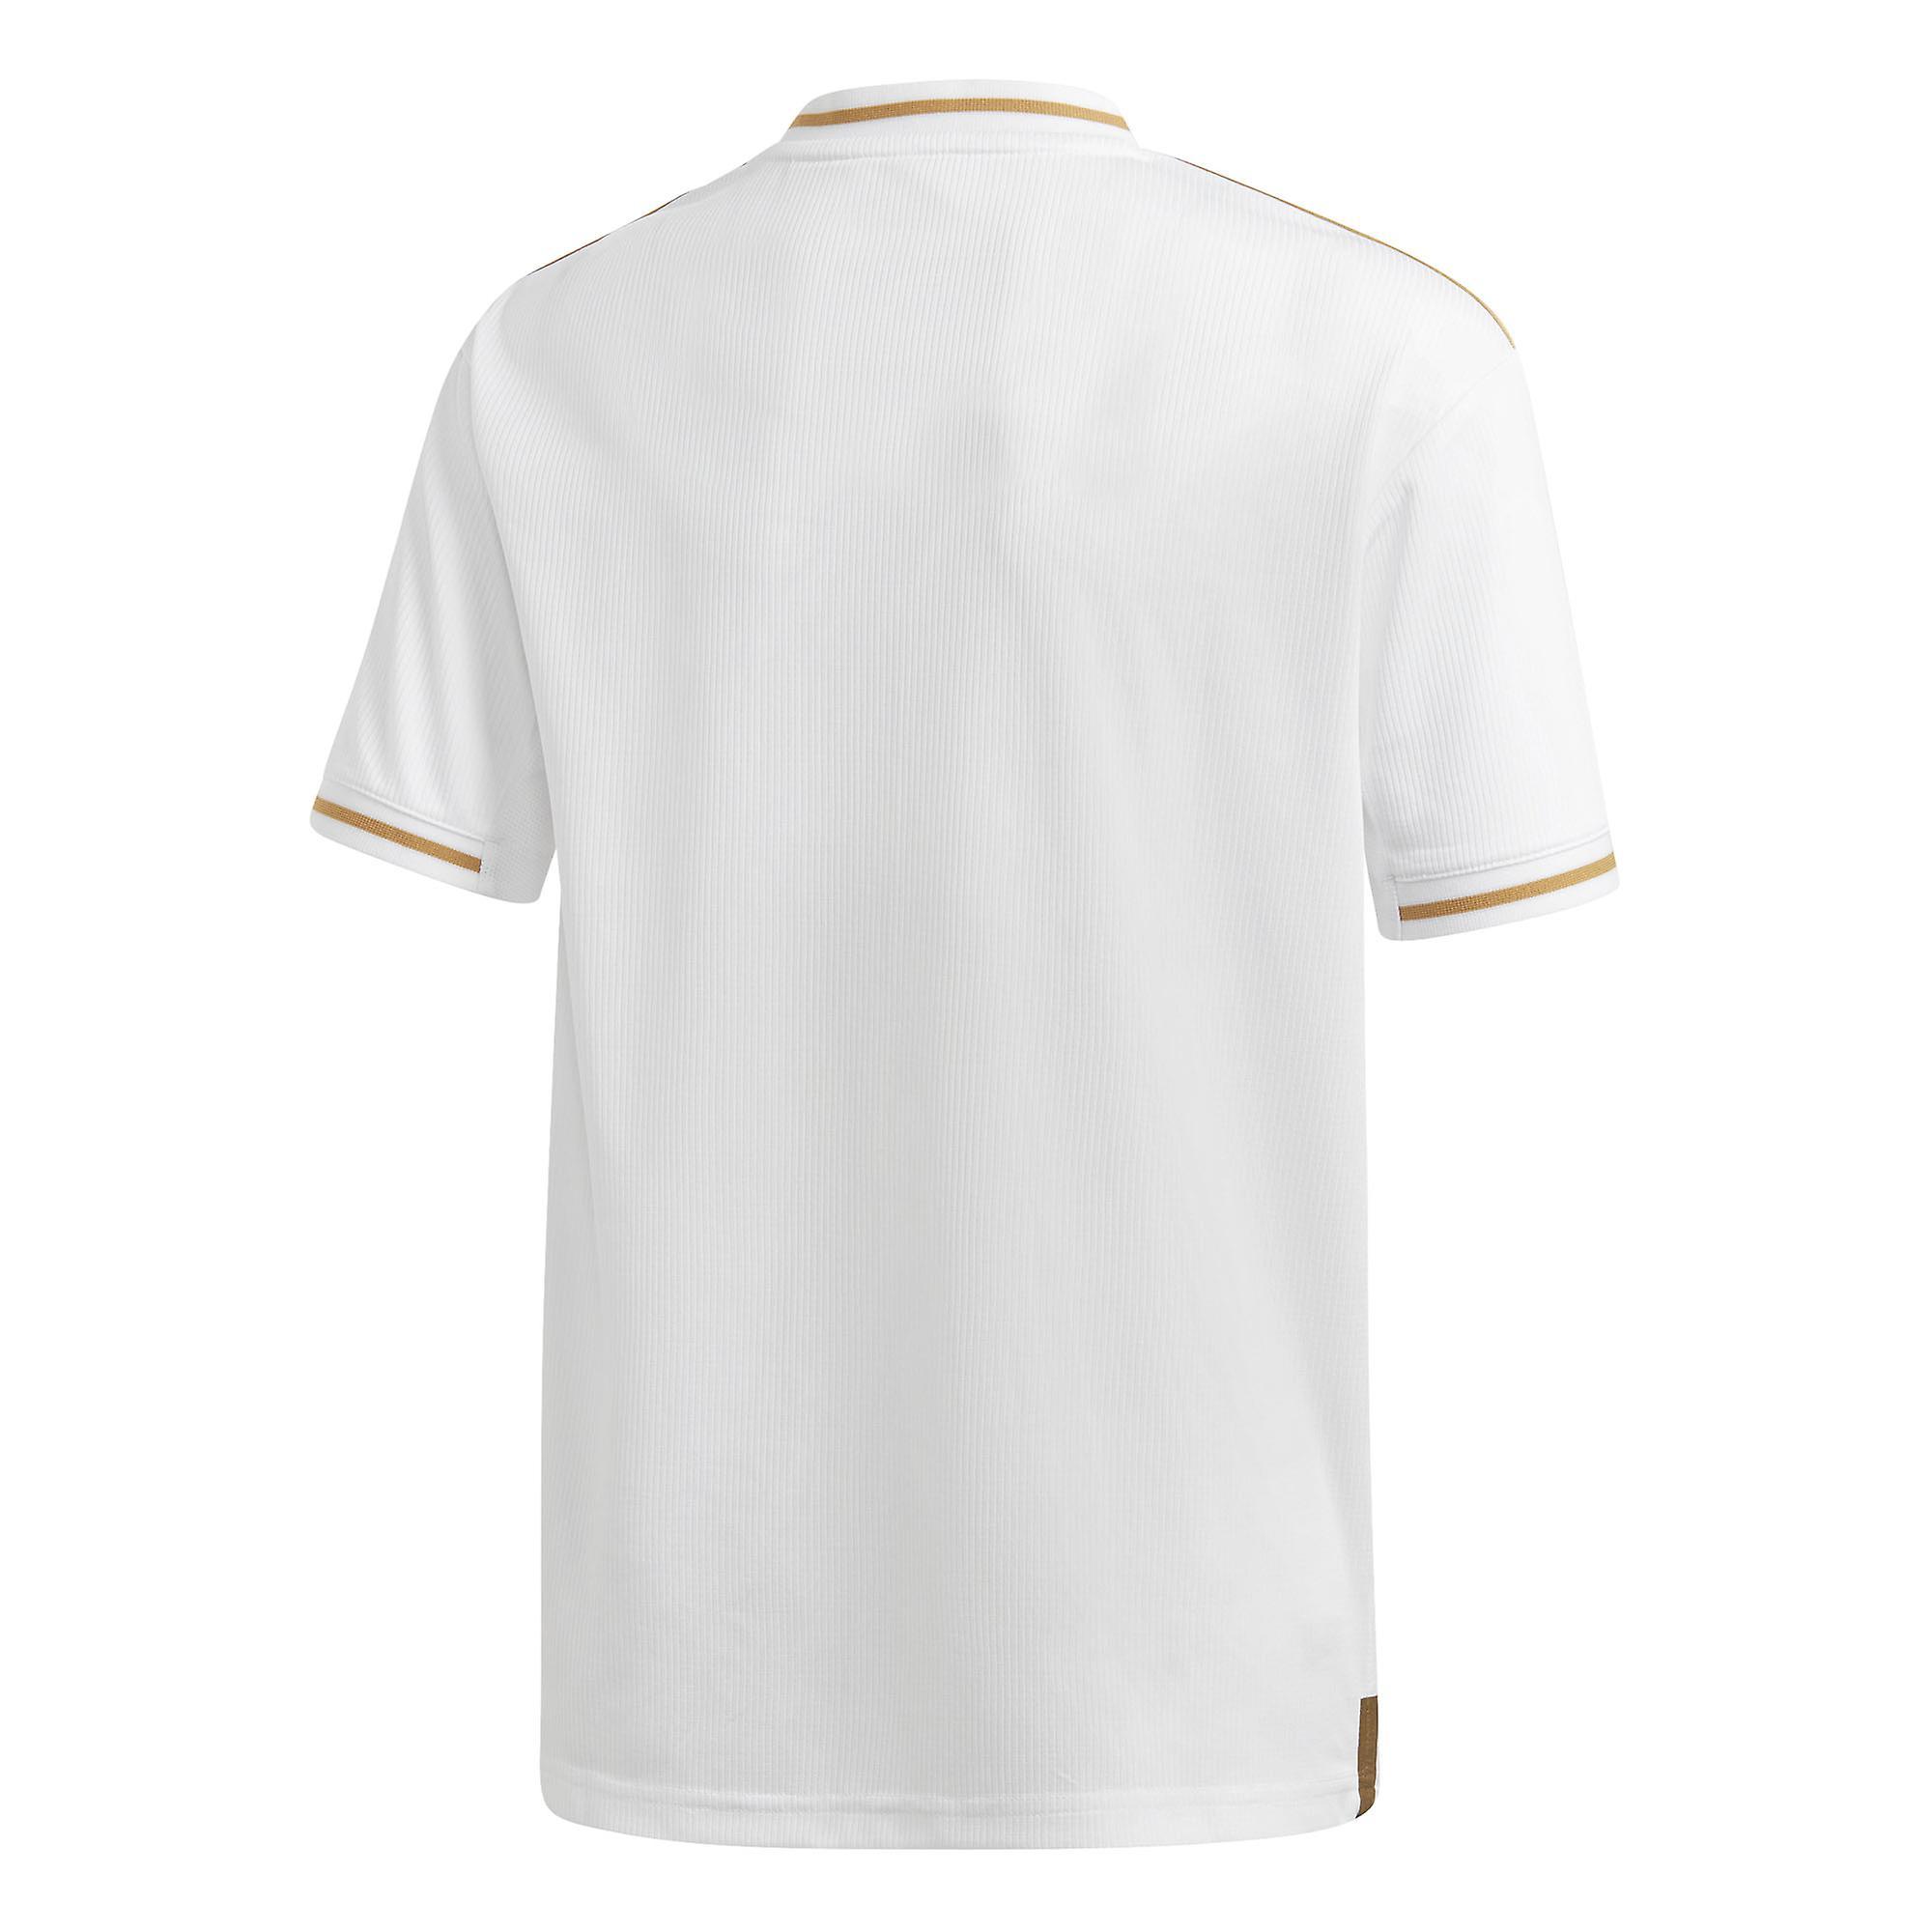 buy popular 29814 890bc adidas Real Madrid 2019/20 Kids Home Football Shirt Jersey White/Gold